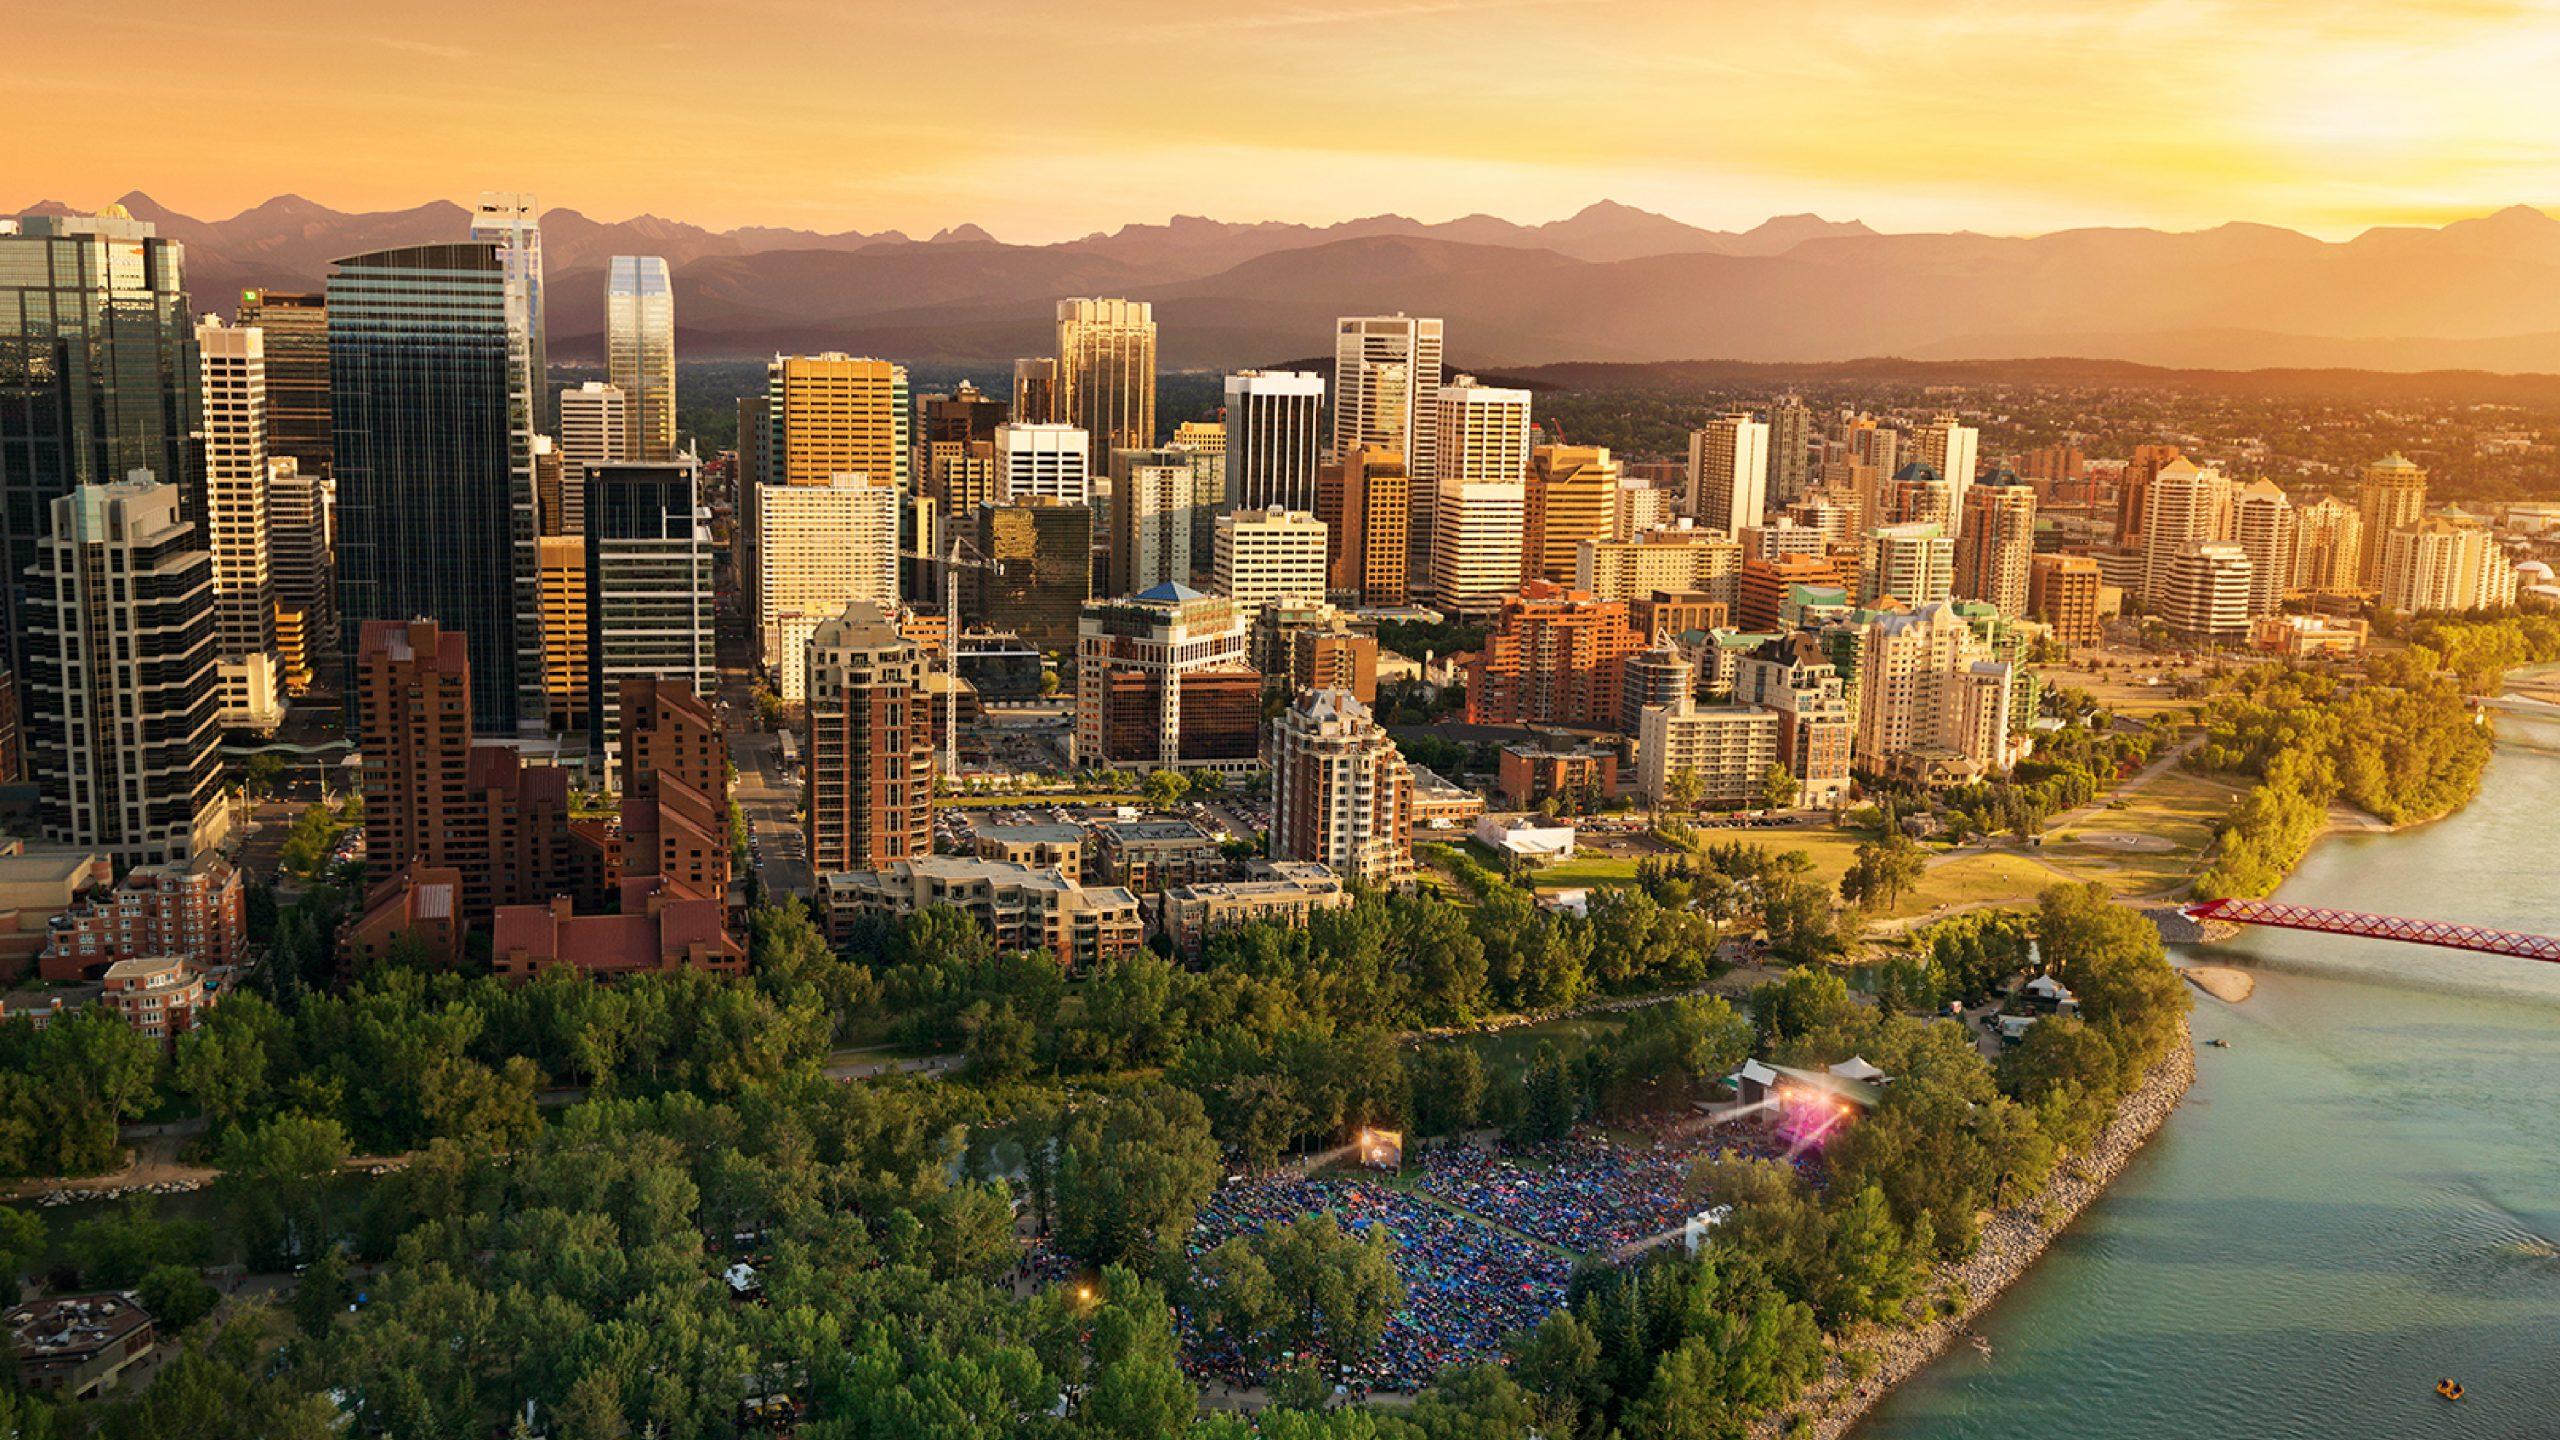 Why Film in Calgary